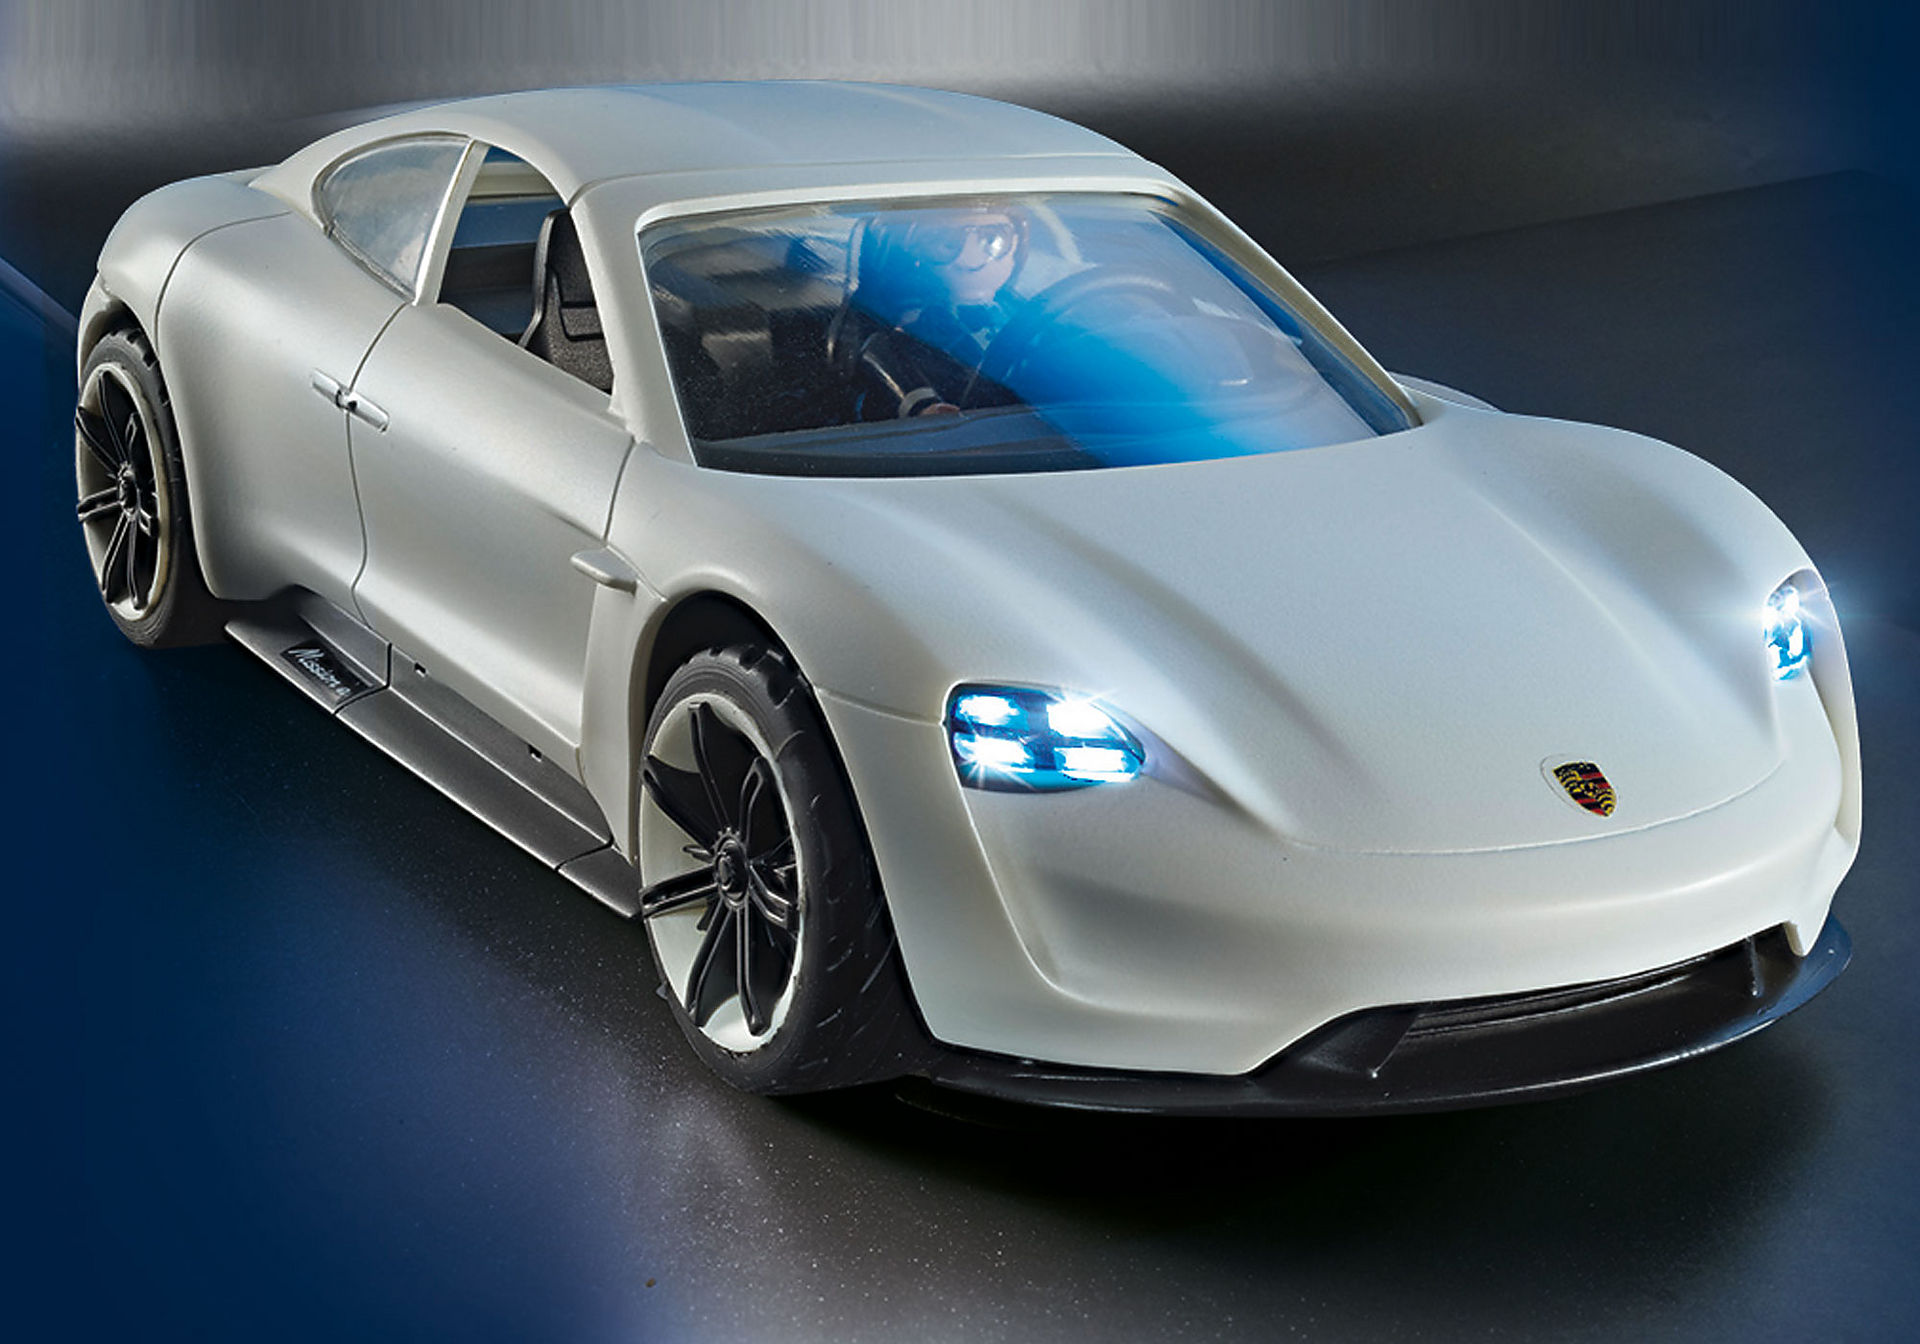 http://media.playmobil.com/i/playmobil/70078_product_extra2/PLAYMOBIL: THE MOVIE Porsche Mission E y Rex Dasher